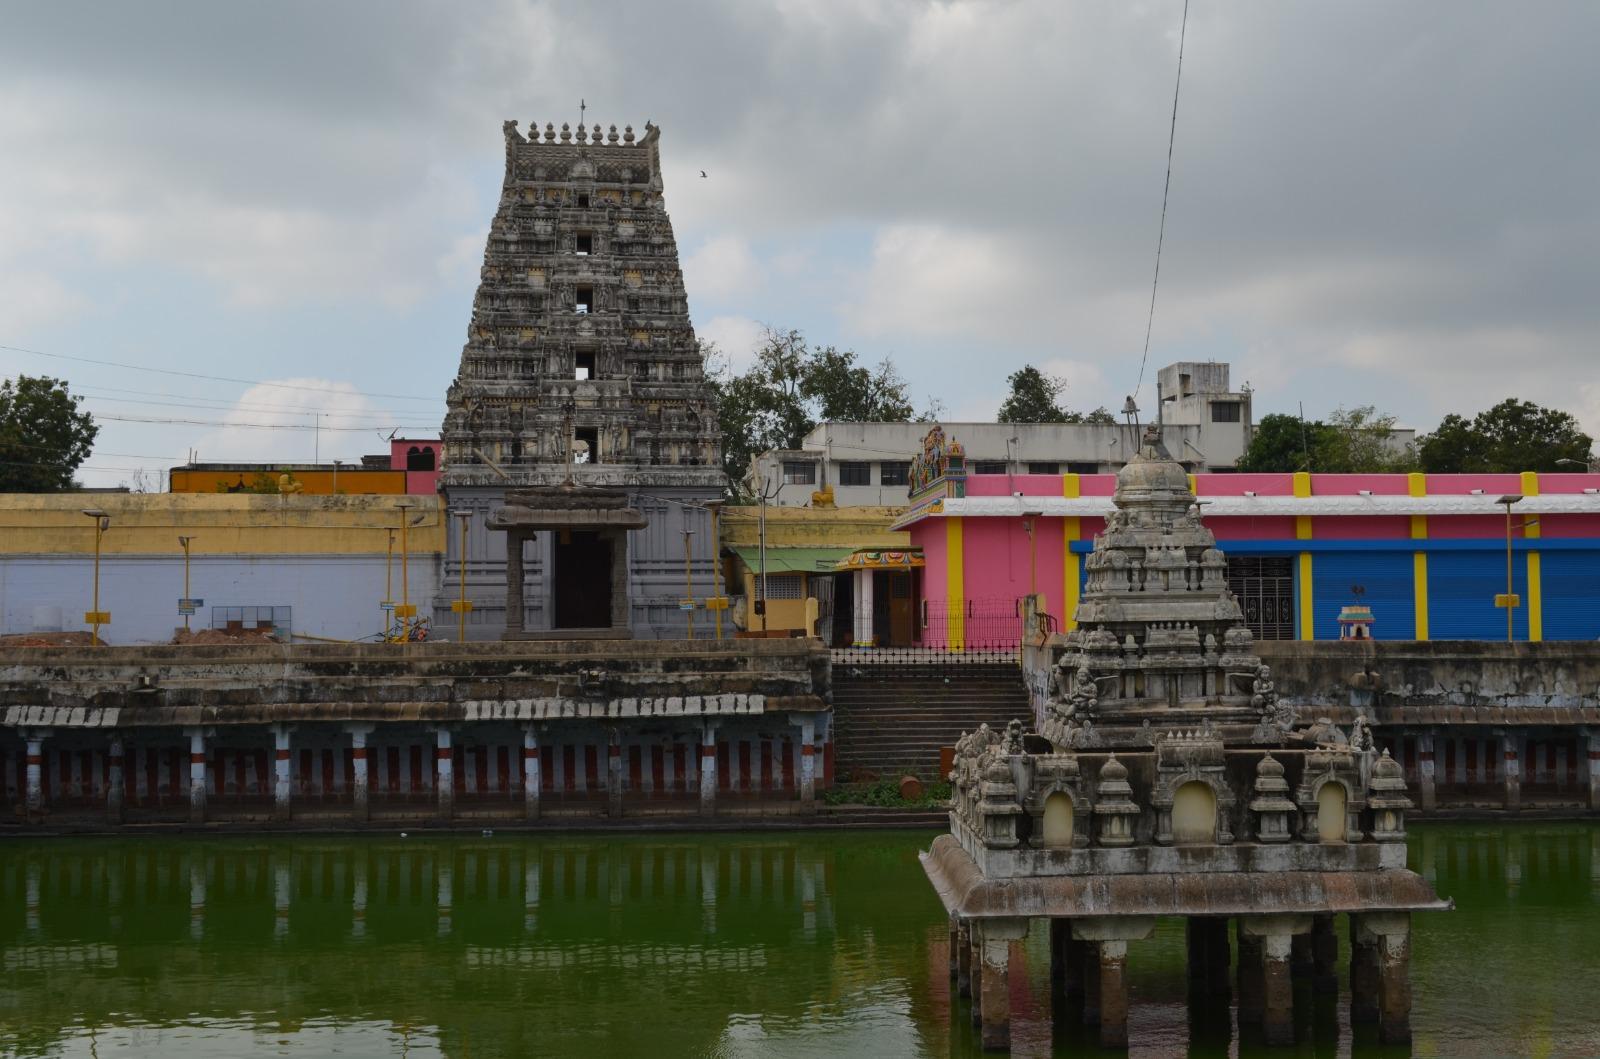 Sri Kanchi Kamakshi Amma Temple Kanchipuram, Tamil Nadu India